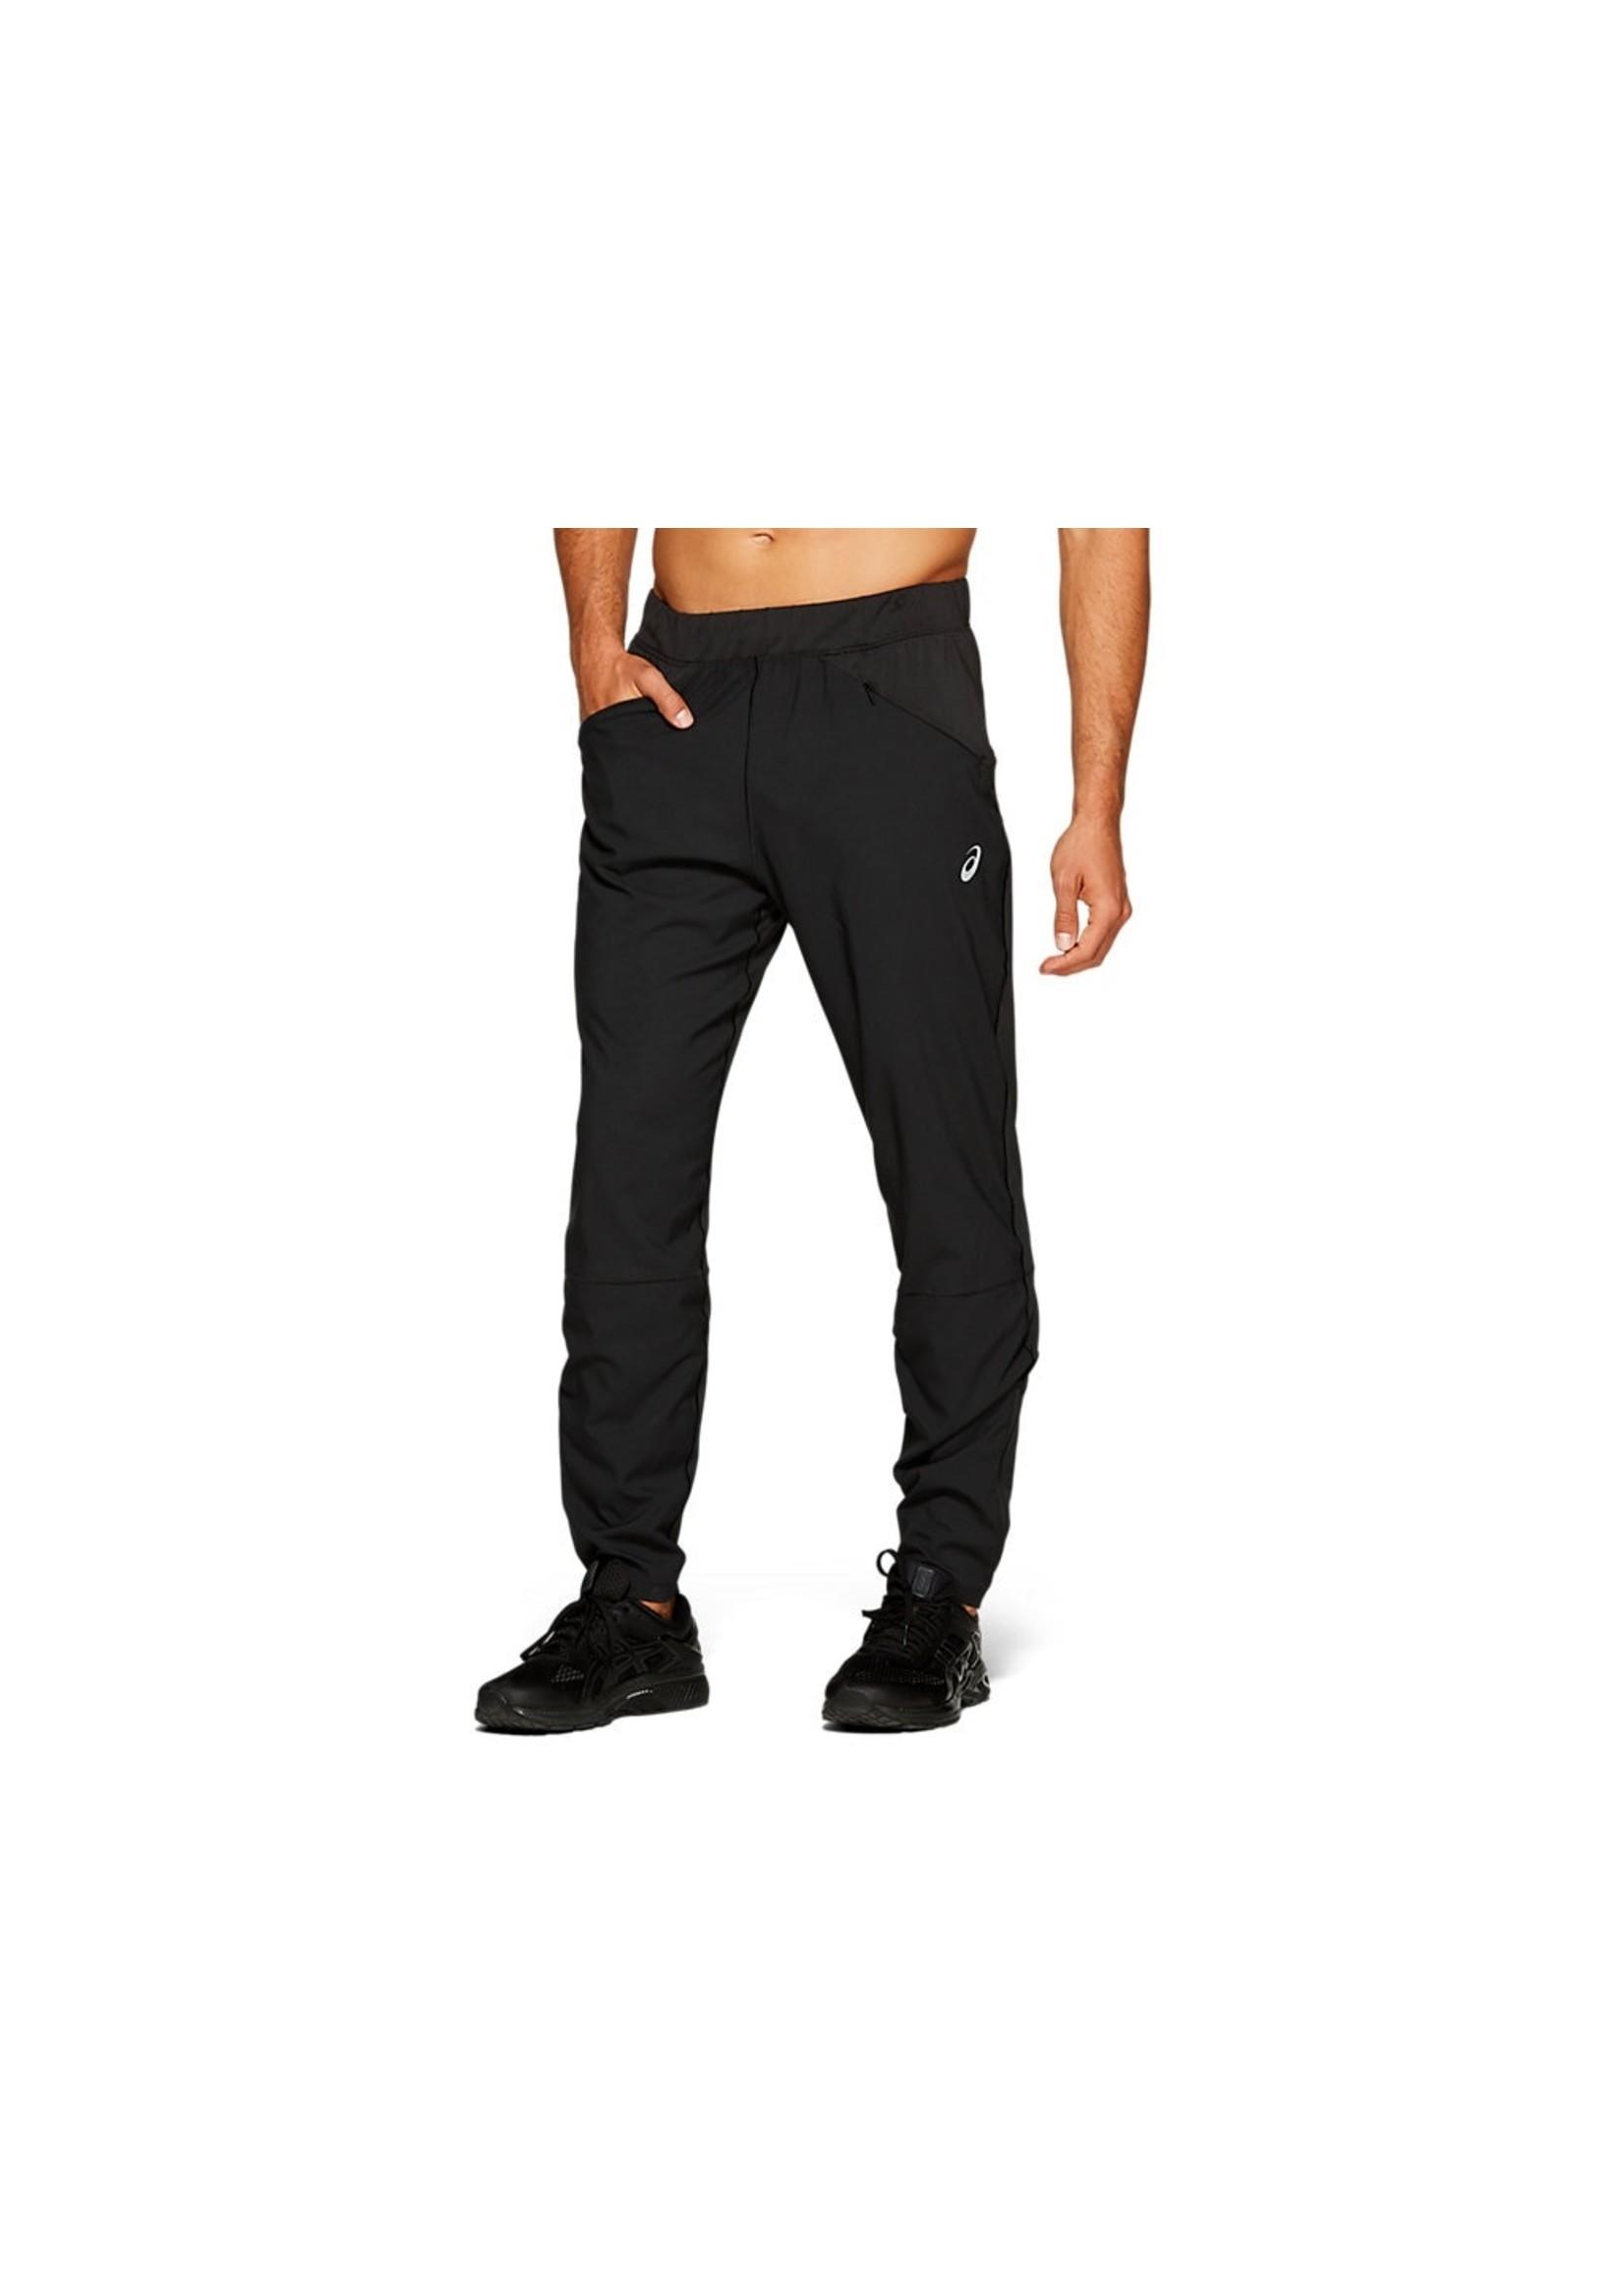 Asics Asics Mens Running Pant, Performance Black